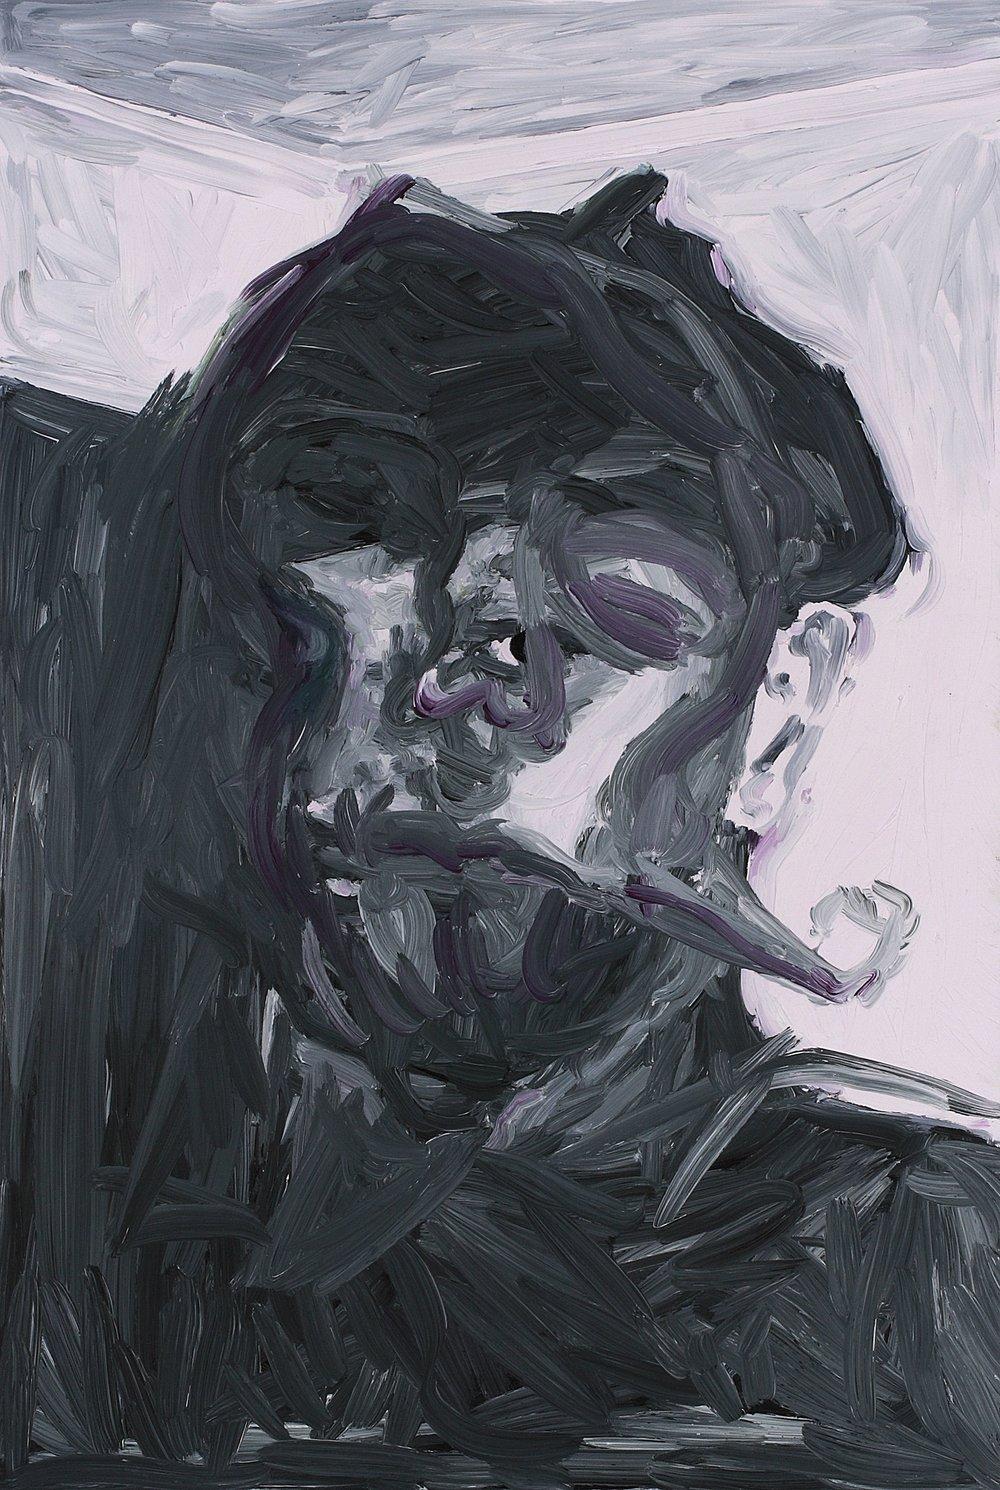 David M Thomas, oil on board, 60 x 40 cm, 2008.